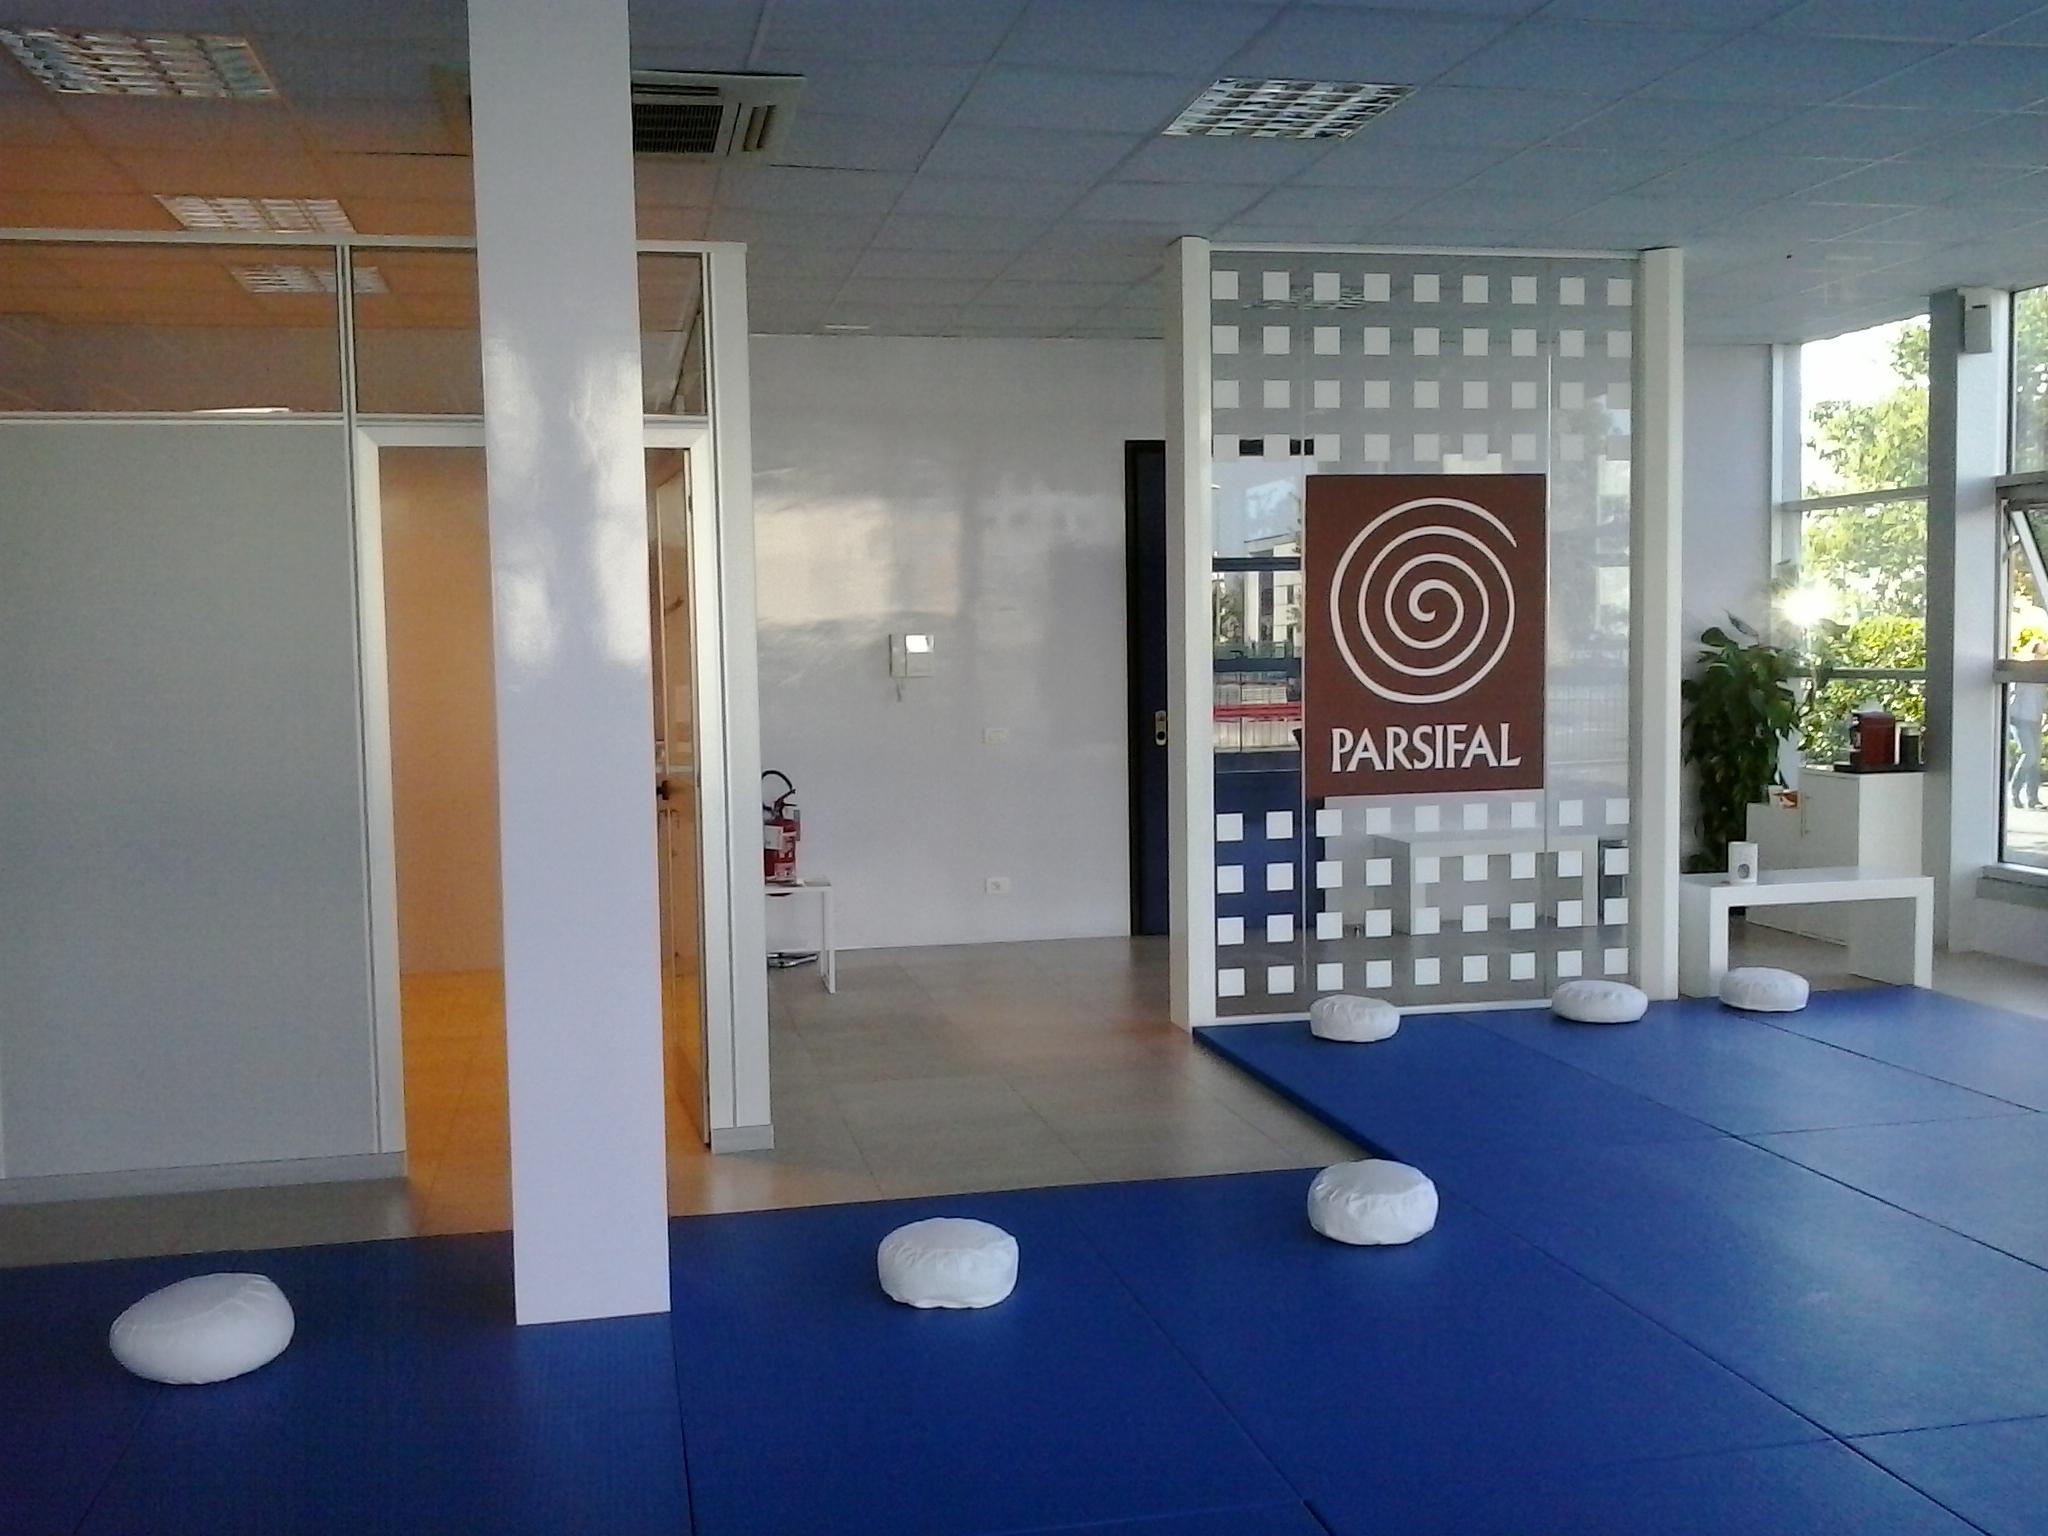 Studio di parsifal yoga academy Crema